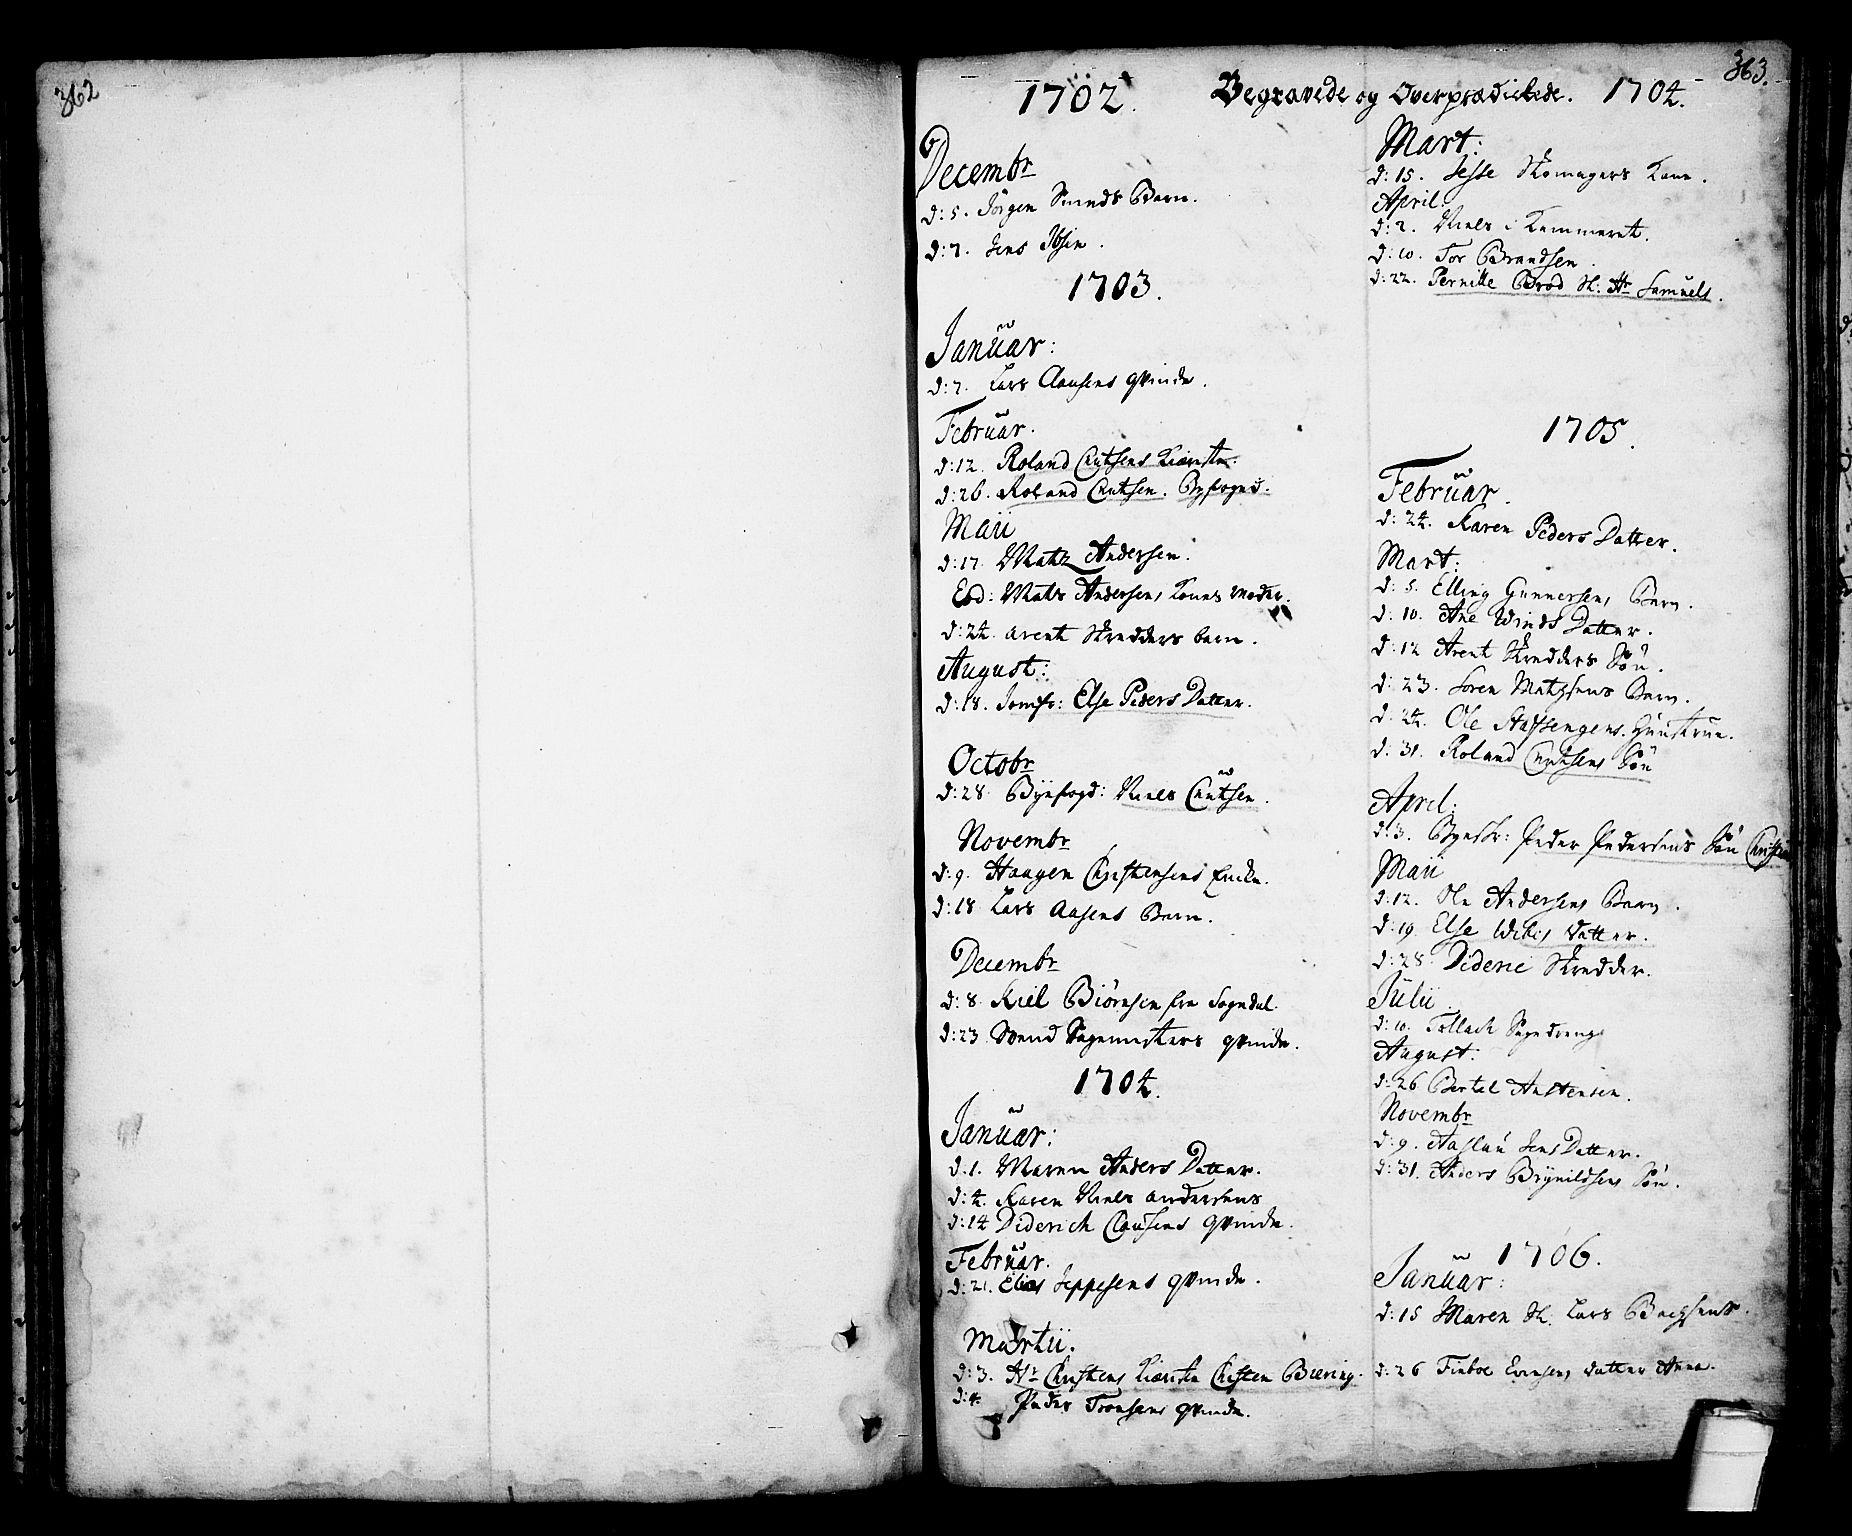 SAKO, Kragerø kirkebøker, F/Fa/L0001: Ministerialbok nr. 1, 1702-1766, s. 362-363